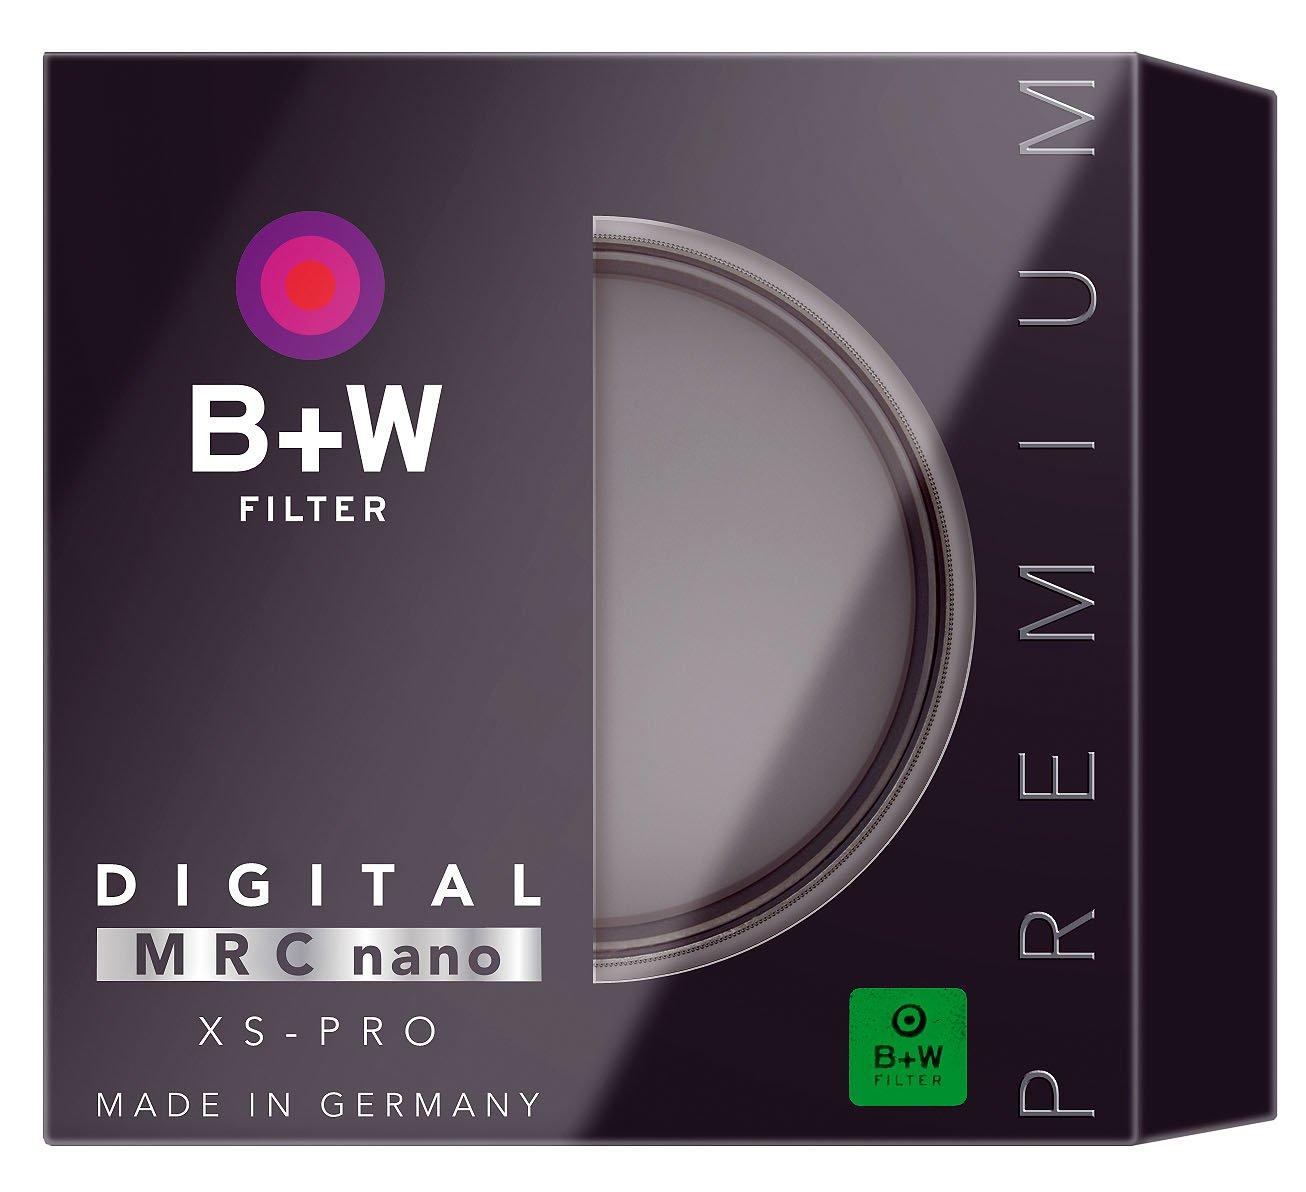 B+W 62mm XS-Pro Kaesemann Circular Polarizer with Multi-Resistant Nano Coating